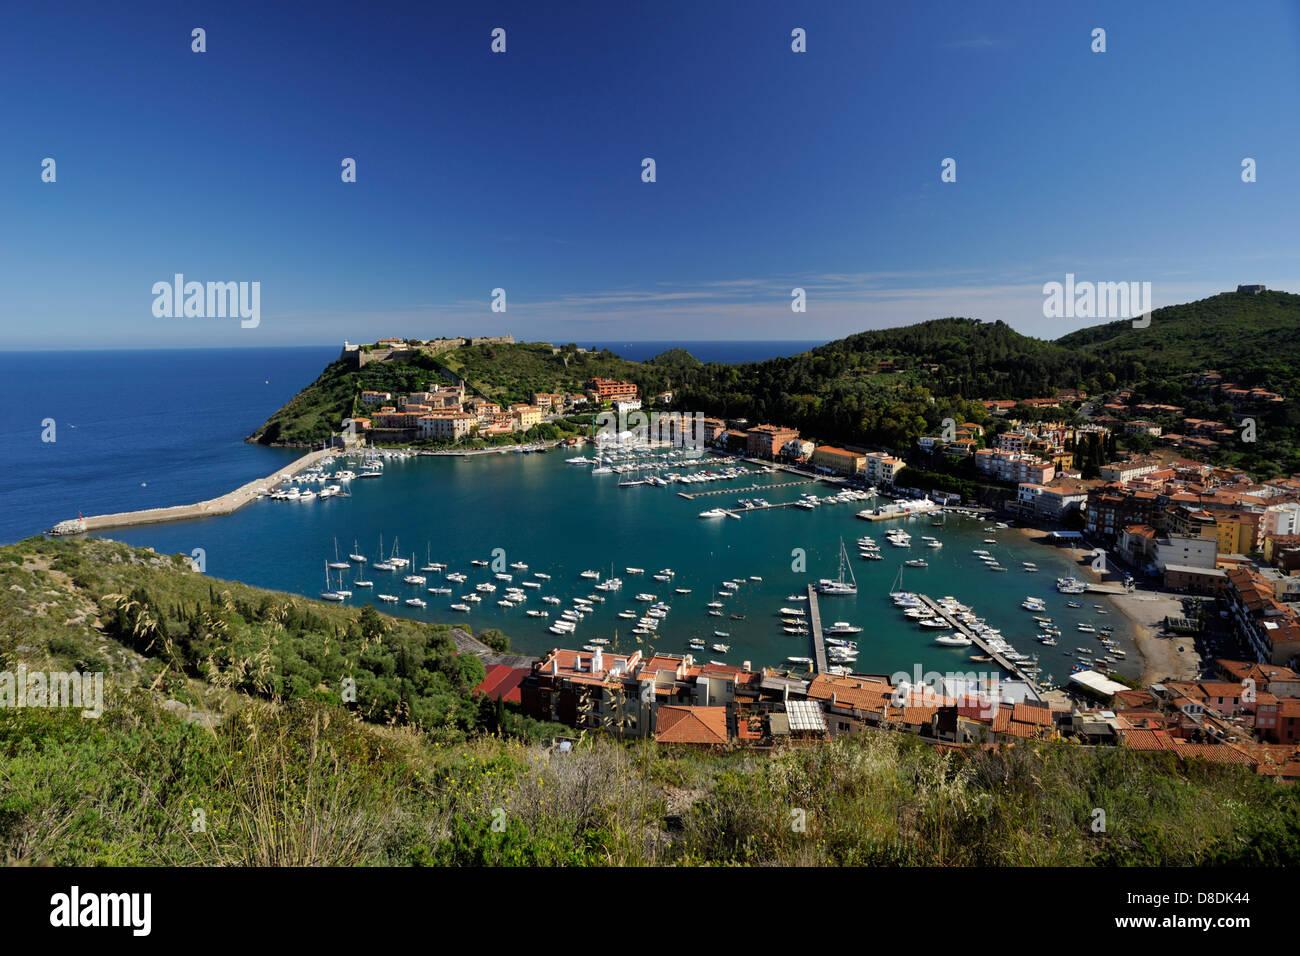 italy, tuscany, argentario, porto ercole - Stock Image